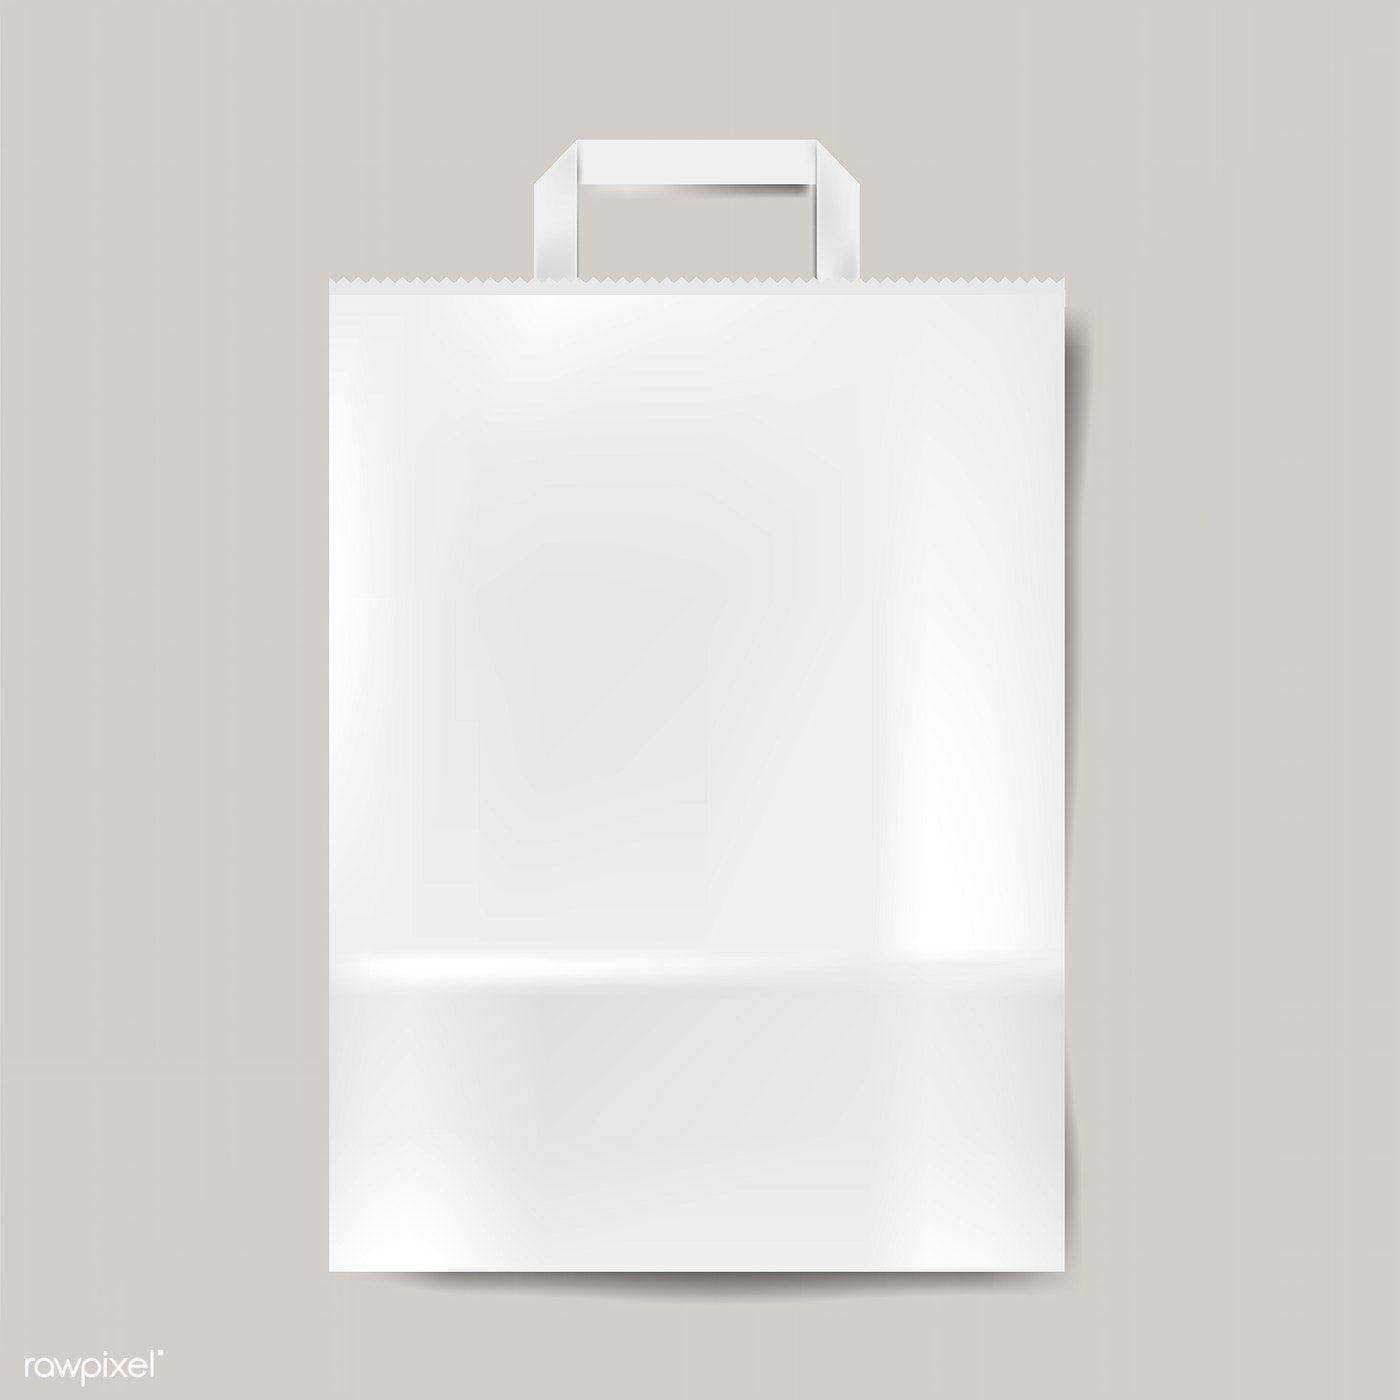 Download Paper Bag Mockup Isolated Vector Free Image By Rawpixel Com Bag Mockup Graphic Design Mockup Paper Bag